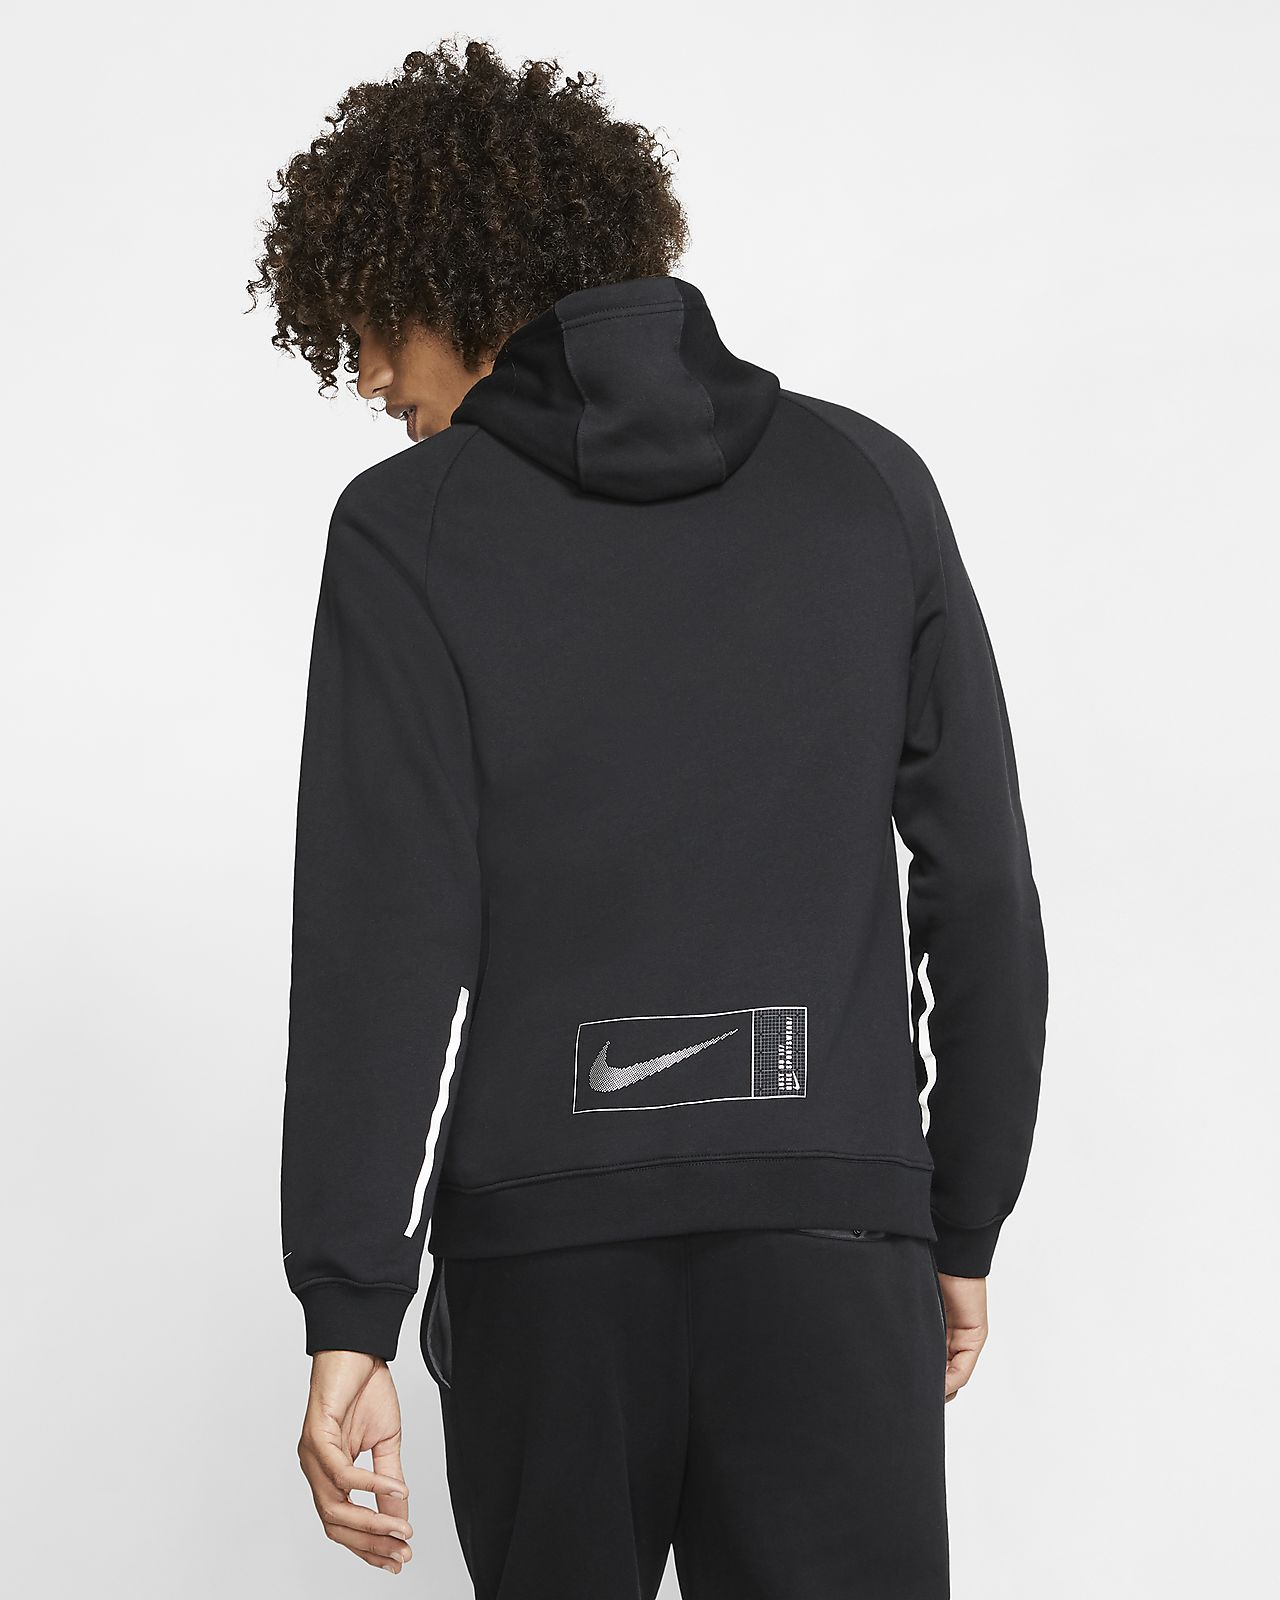 Sweat à capuche Nike Sportswear pour Homme.